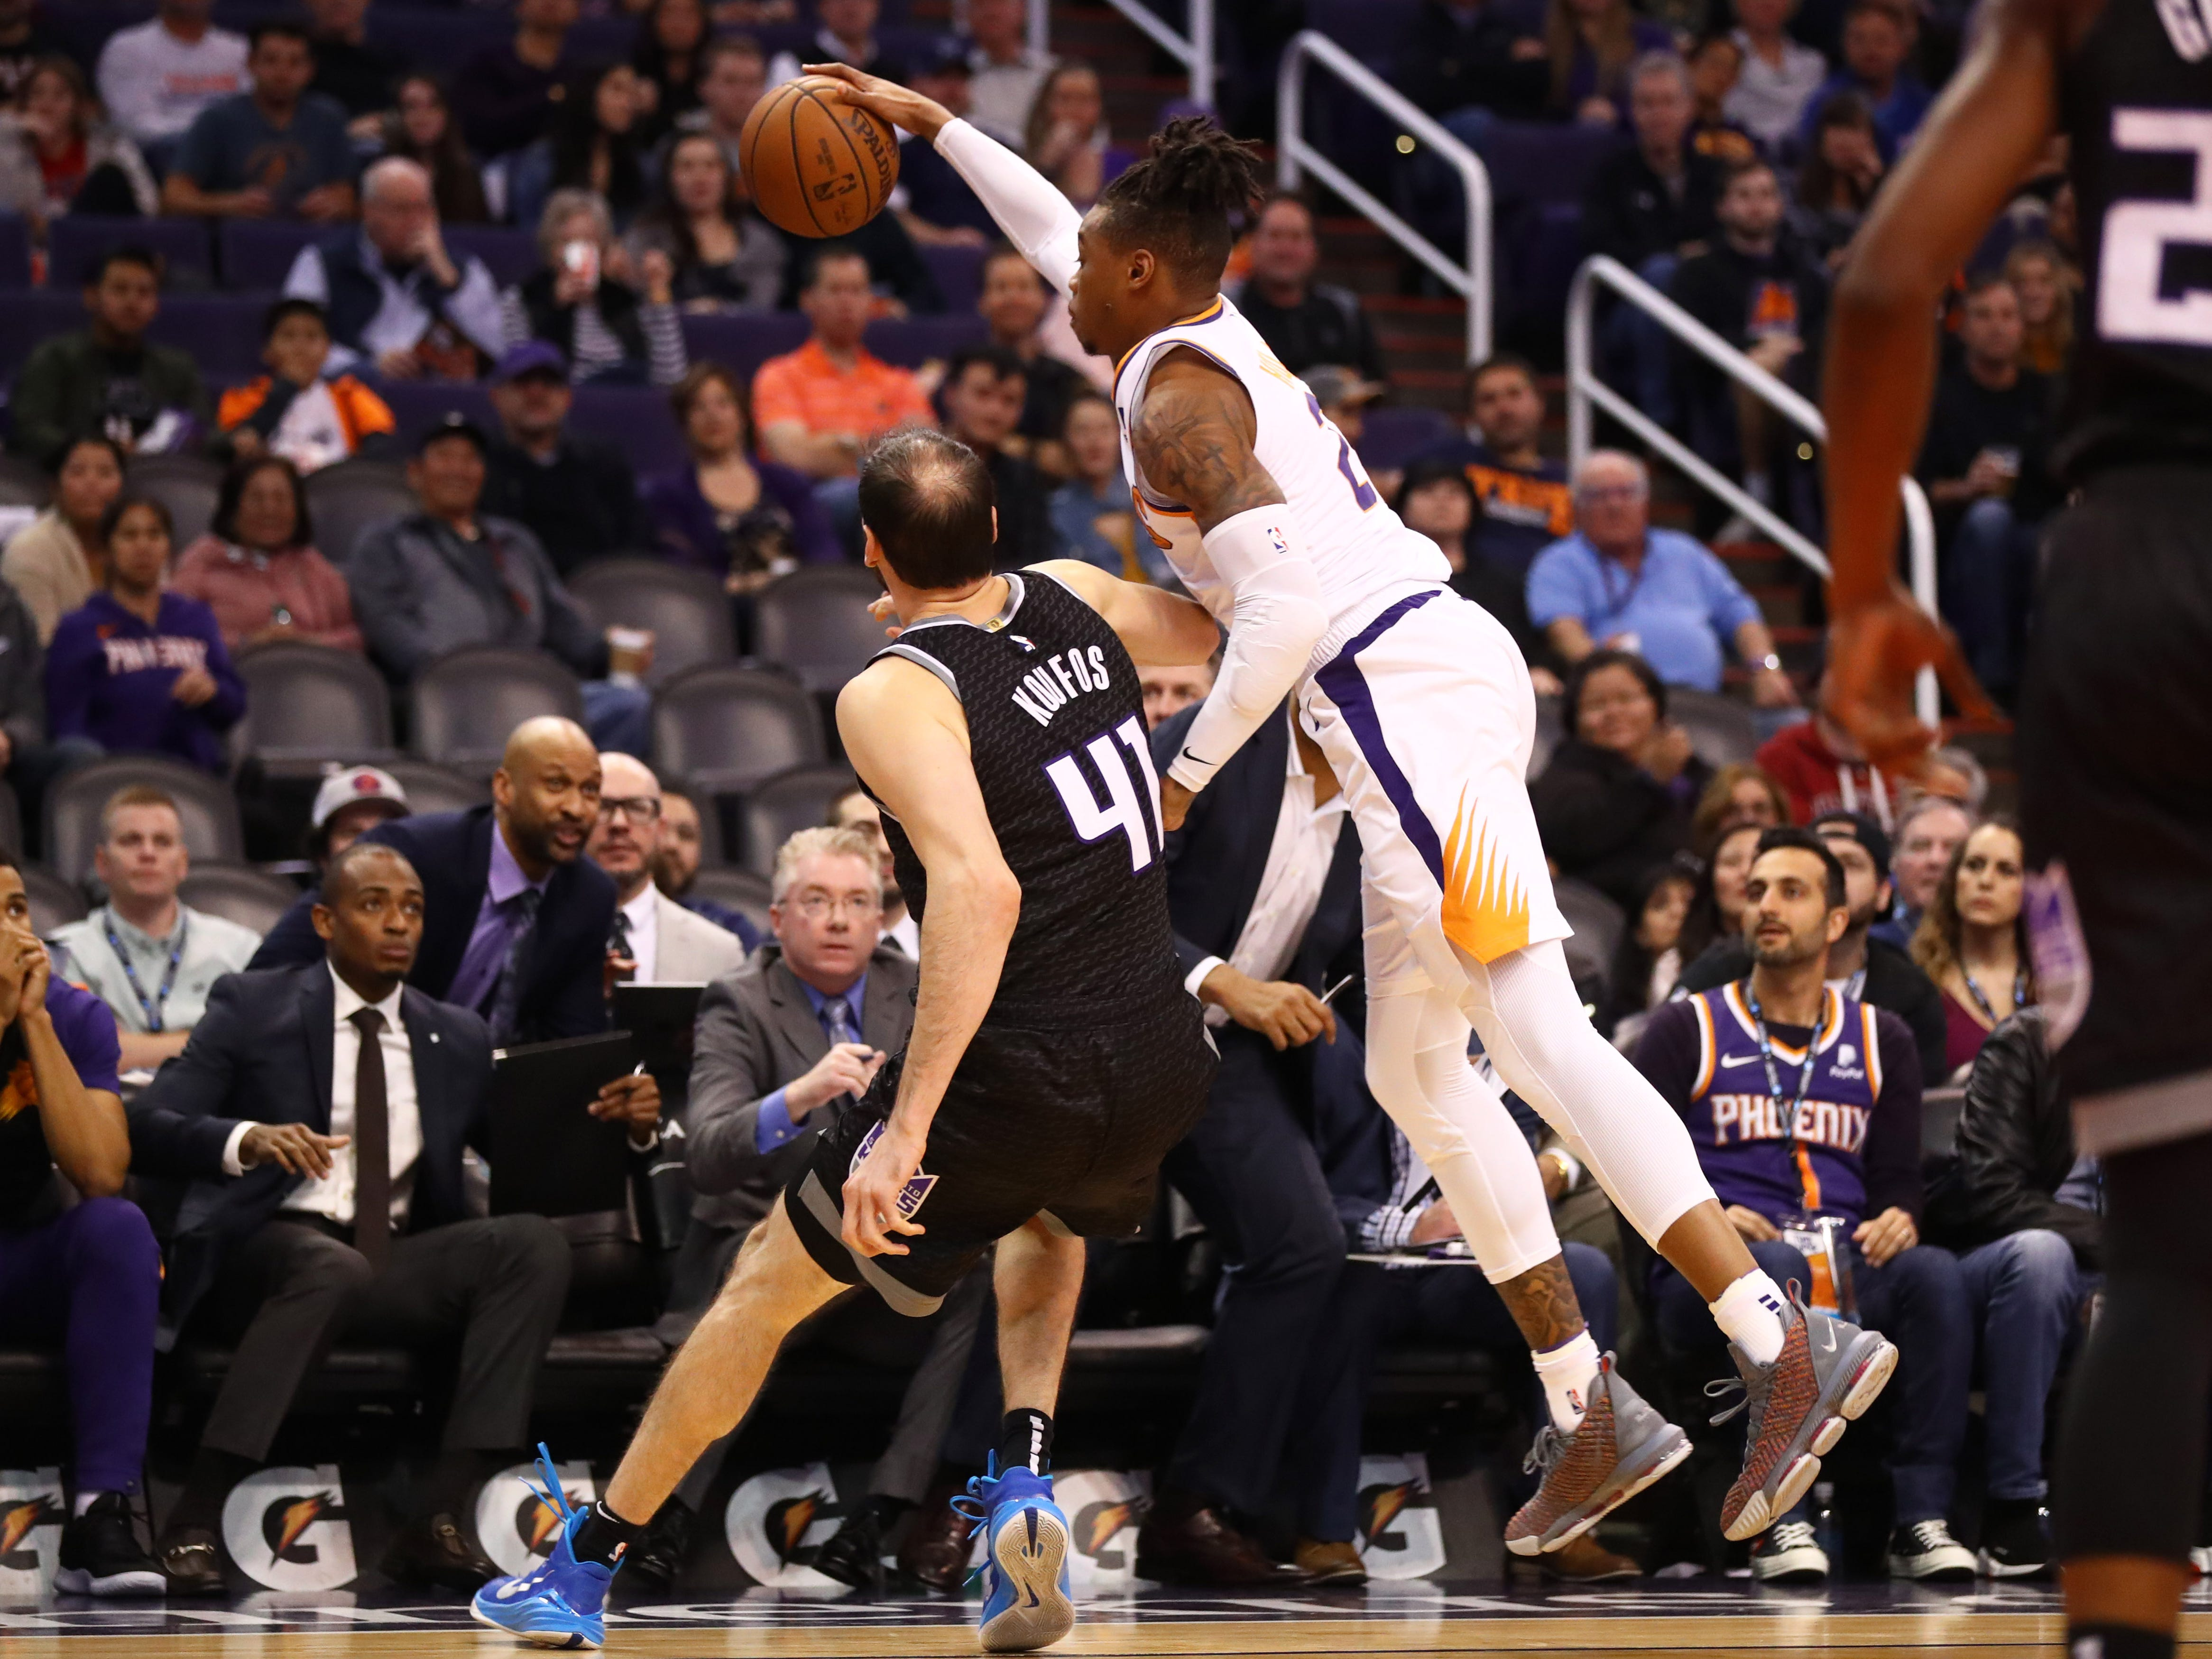 Jan 8, 2019; Phoenix, AZ, USA; Phoenix Suns forward Richaun Holmes (right) grabs a rebound against Sacramento Kings center Kosta Koufos (41) in the first half at Talking Stick Resort Arena. Mandatory Credit: Mark J. Rebilas-USA TODAY Sports